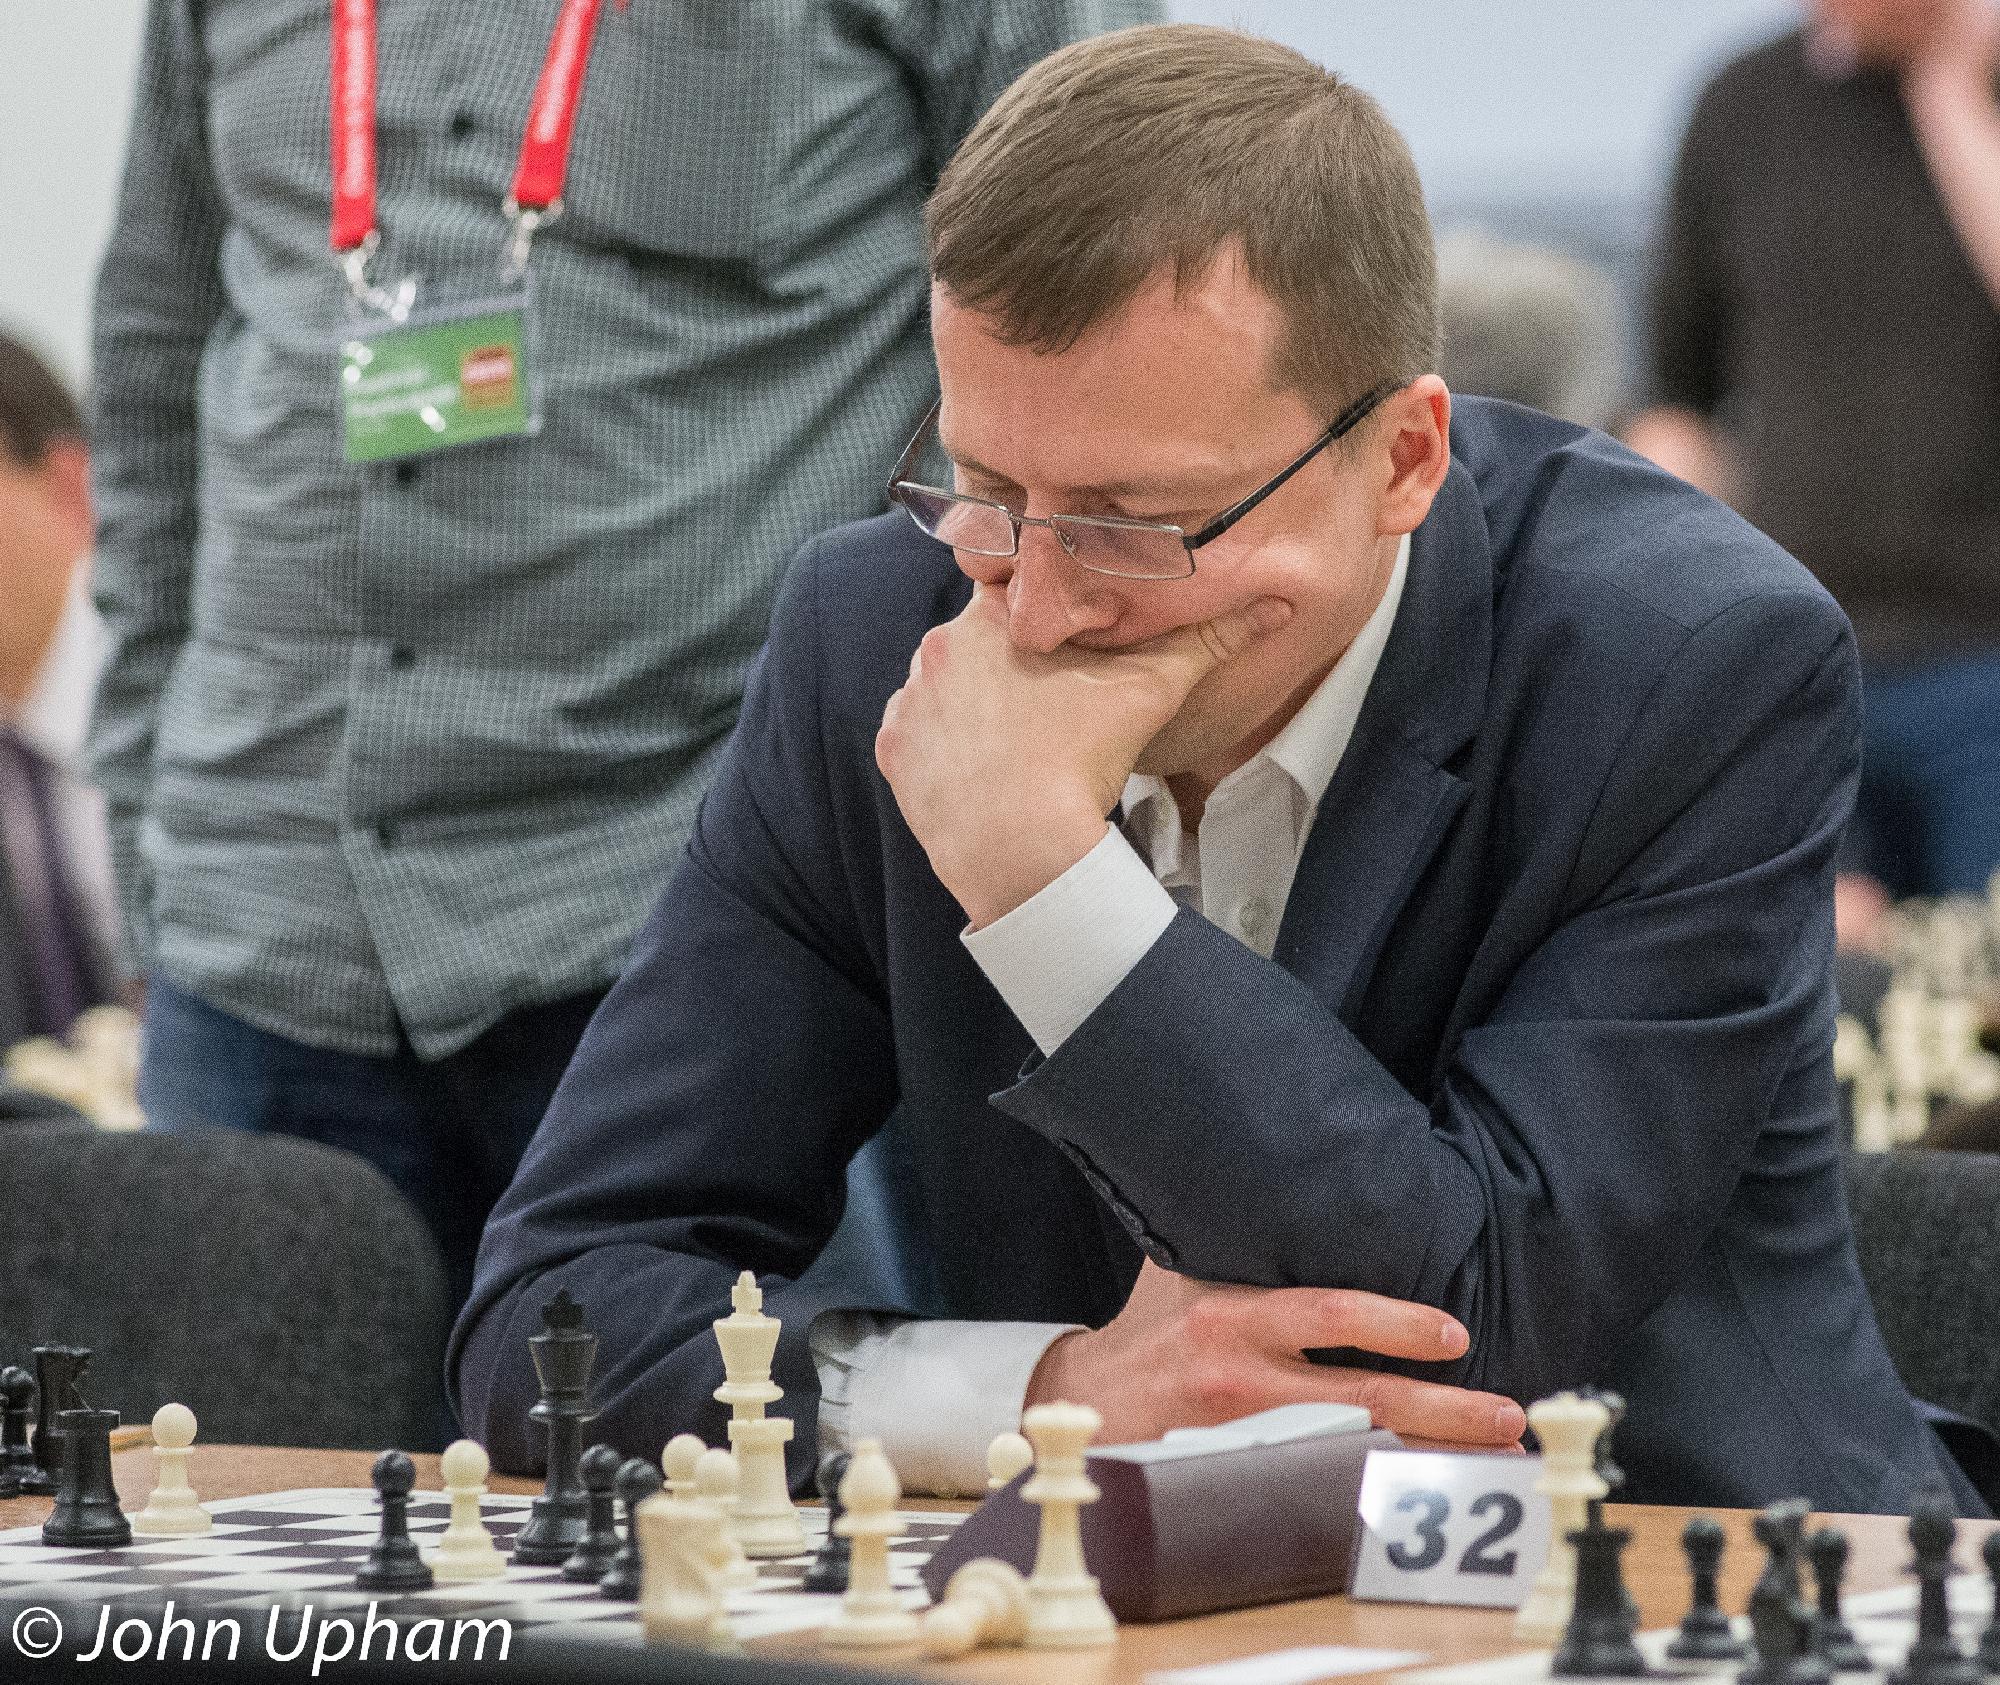 GM Alexander Cherniaev, London Chess Classic 2014, courtesy of John Upham Photography